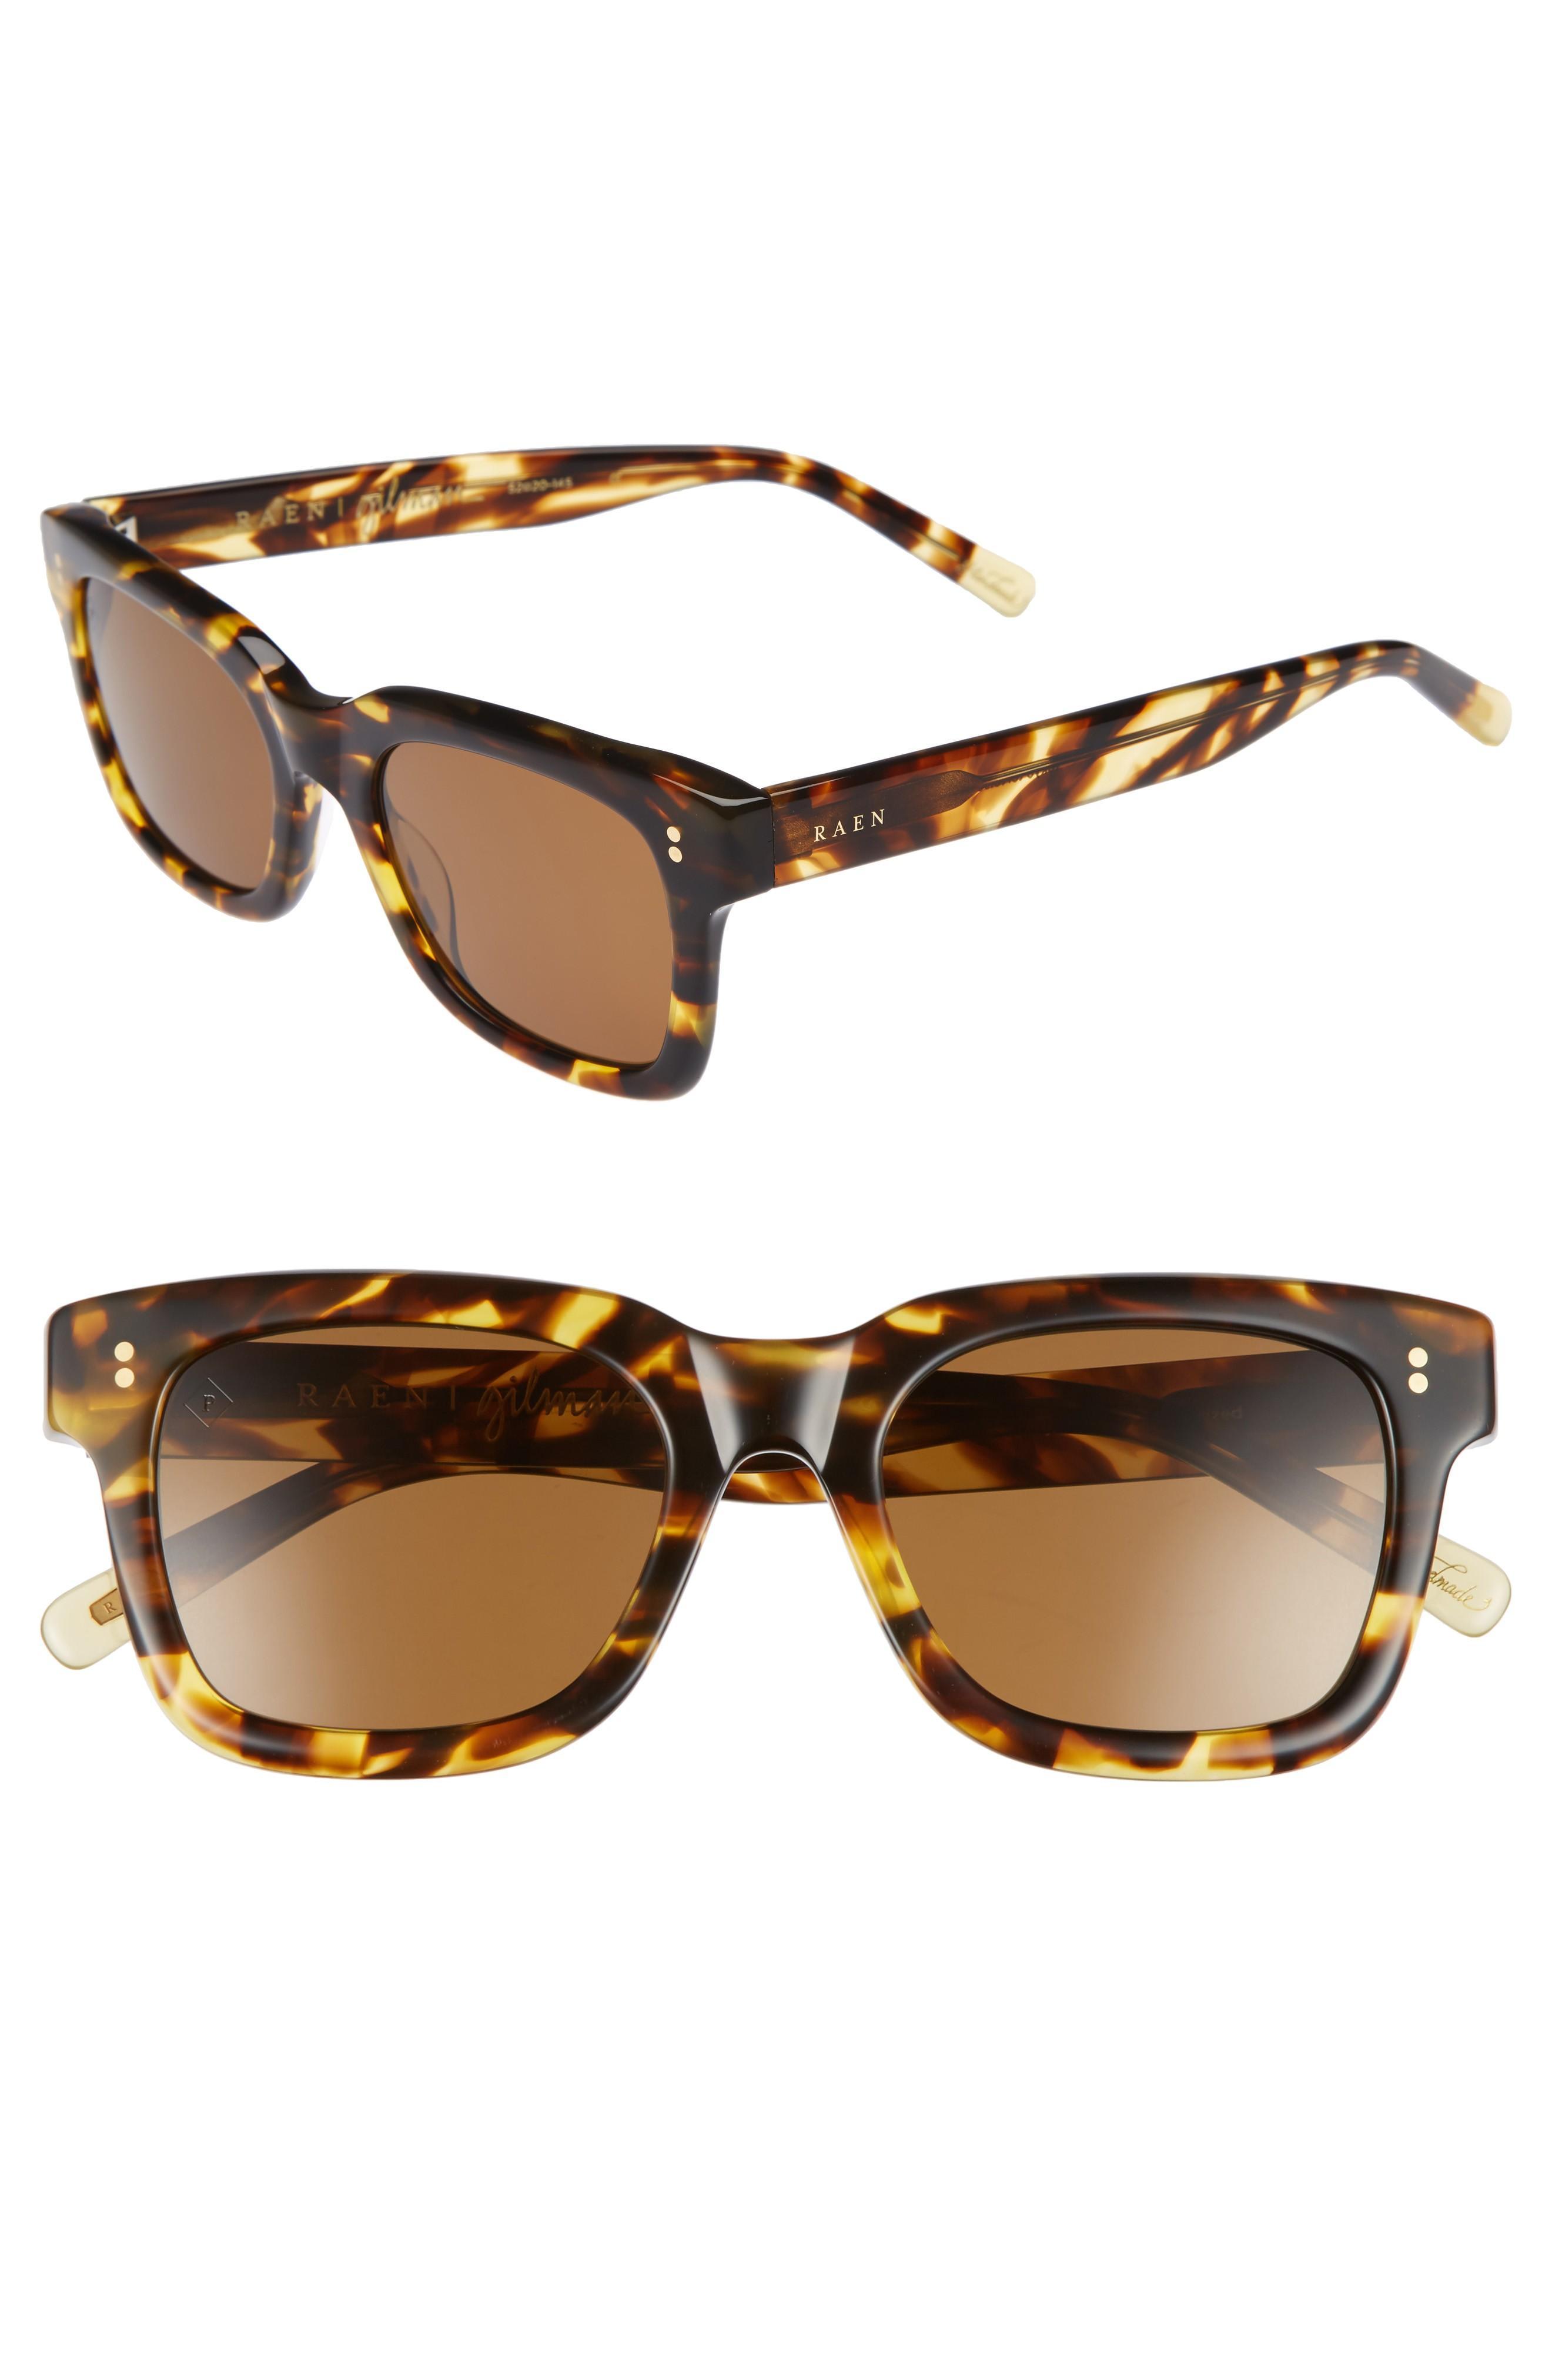 e2a9b466fdb Raen Gilman 52Mm Polarized Sunglasses - Tokyo Tortoise  Brown